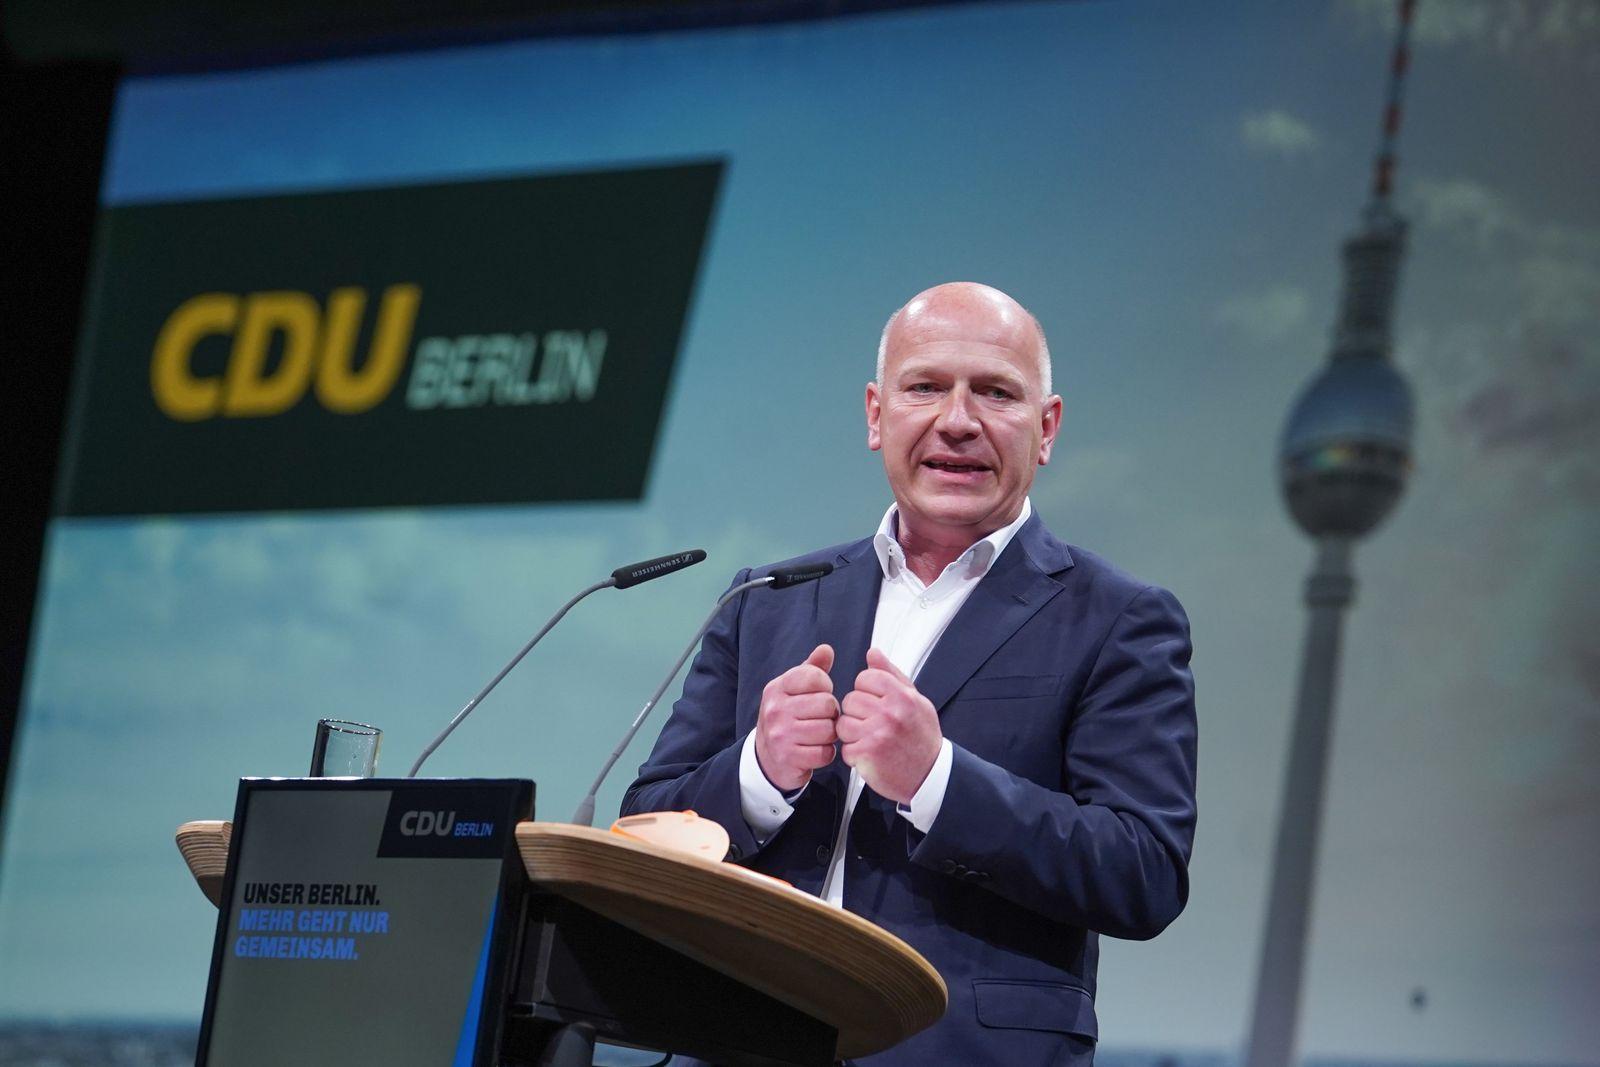 Parteitag CDU Berlin